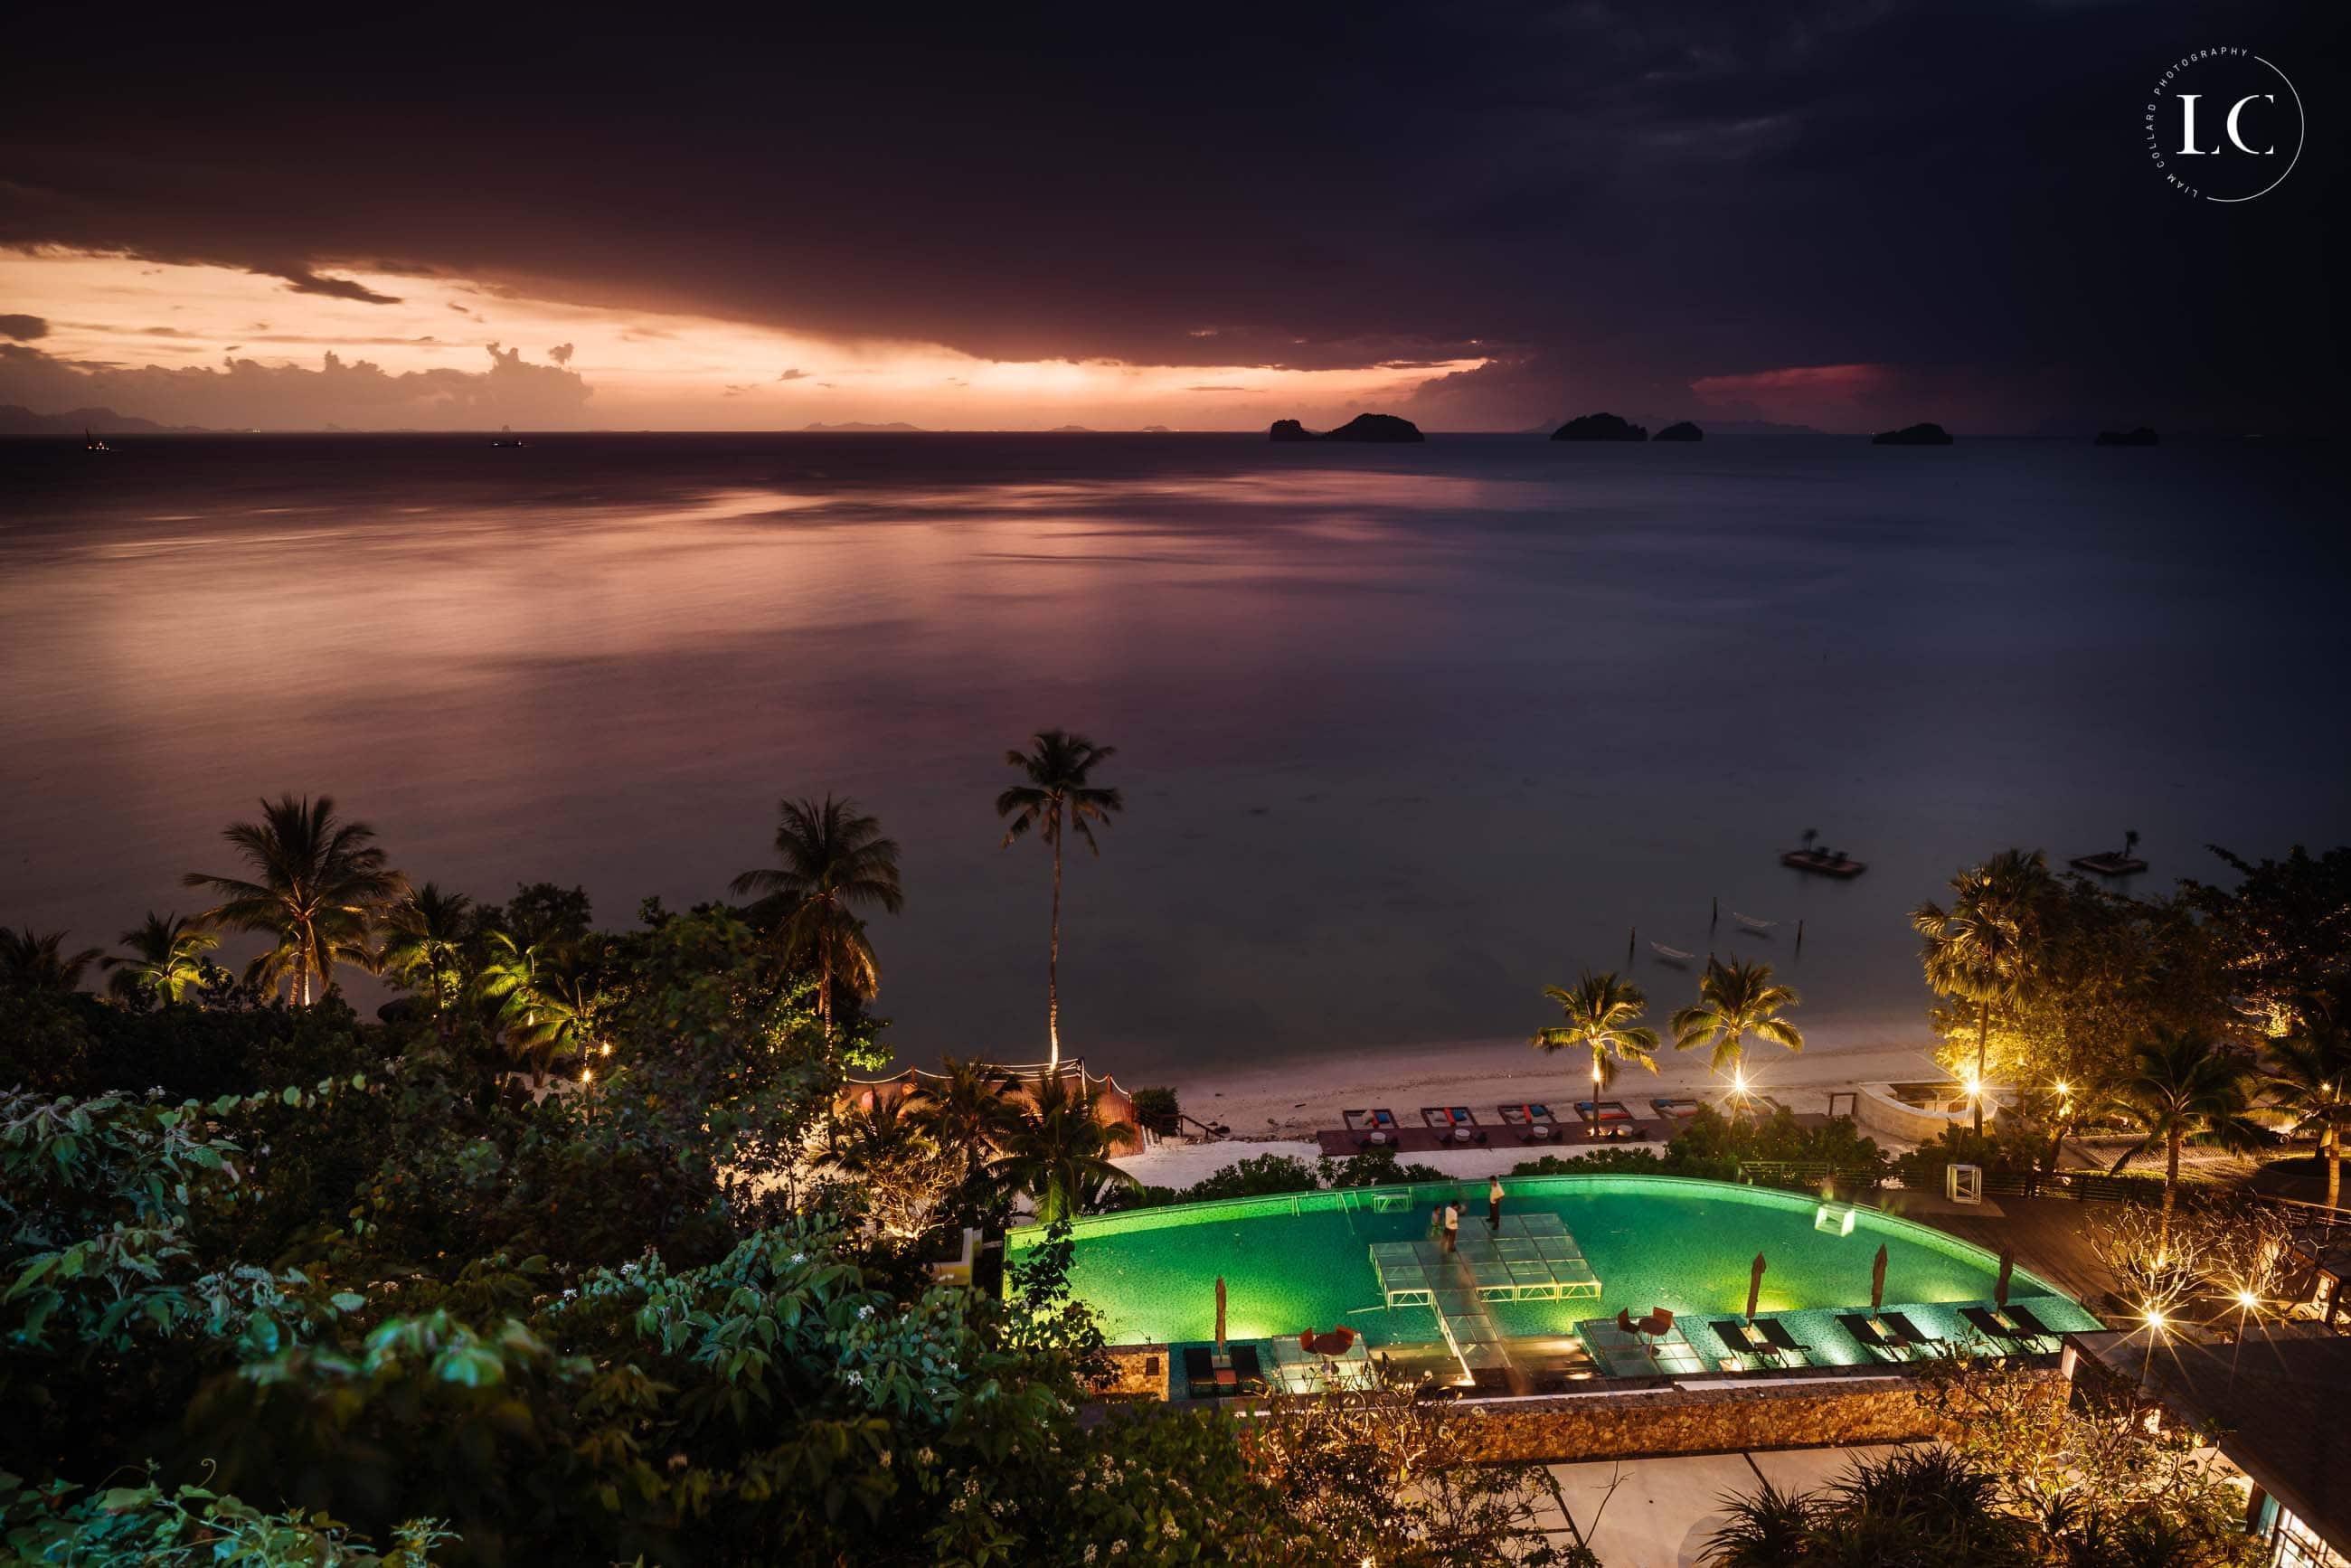 Night time view of luxury resort